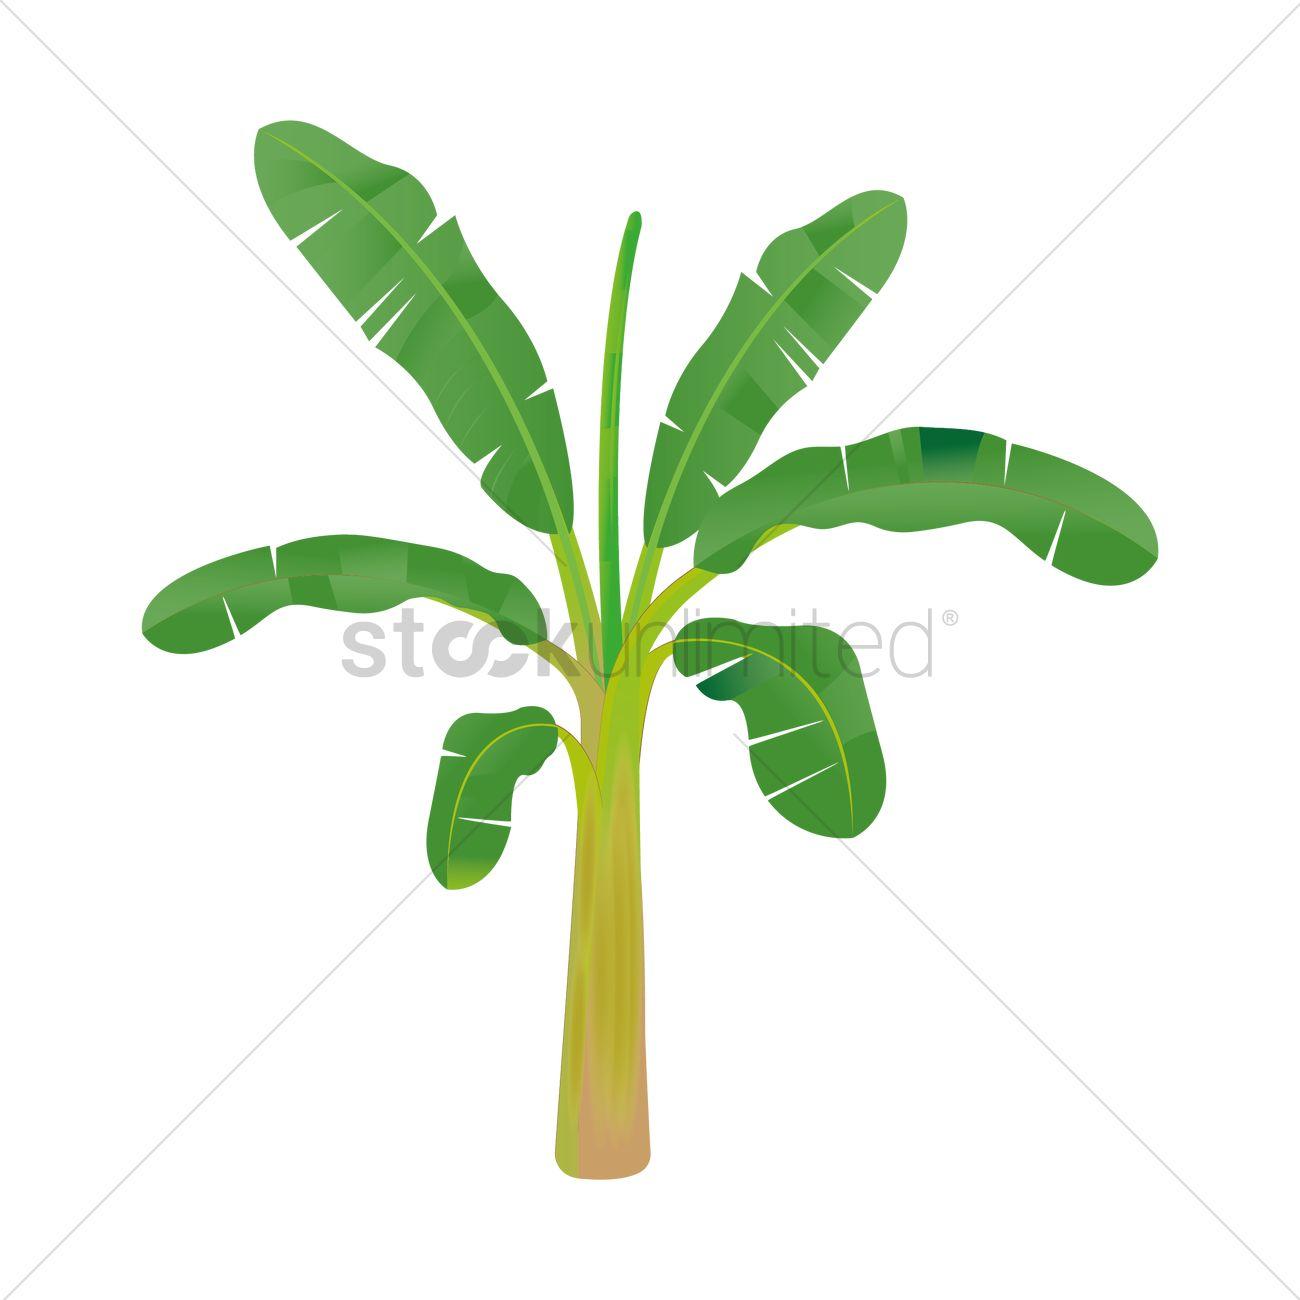 banana tree vector image 1935823 stockunlimited rh stockunlimited com banana tree clipart banana tree pictures clip art